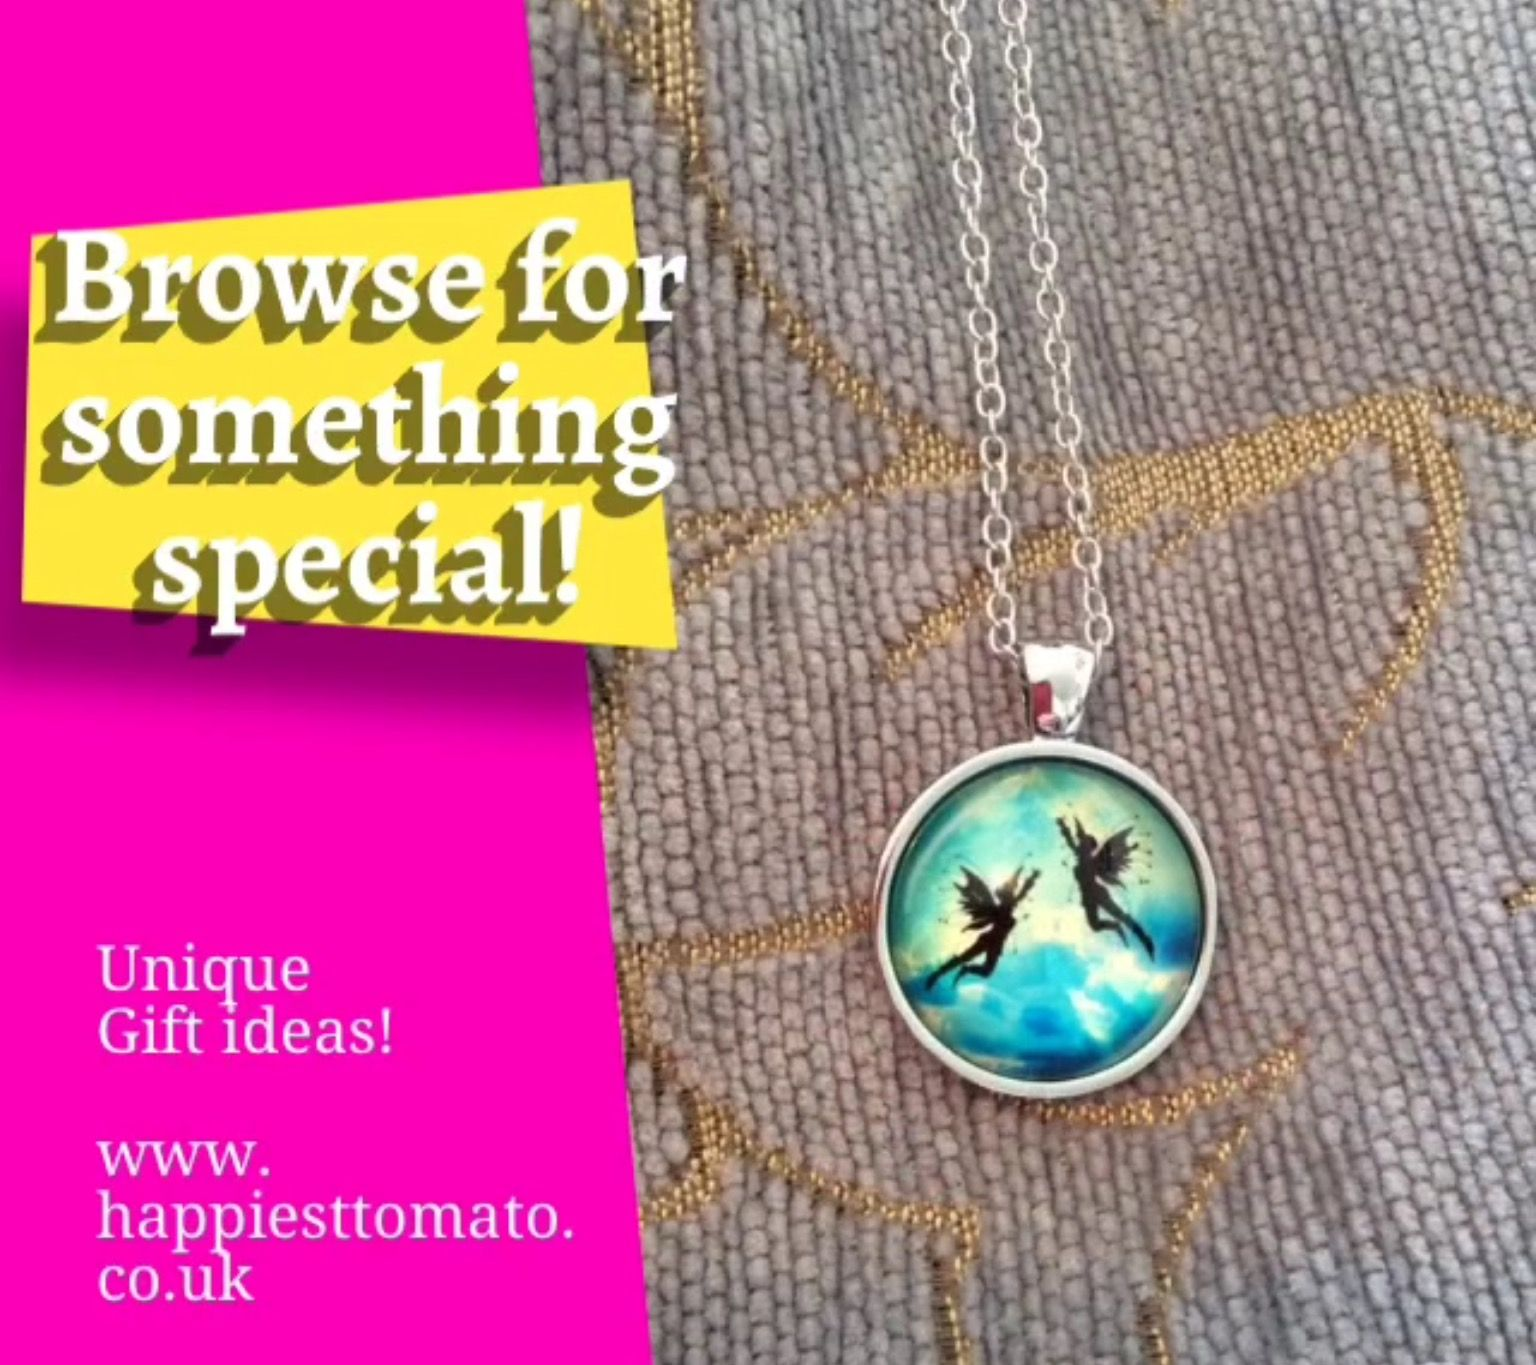 Unique gift ideas slnanht gift birthday present